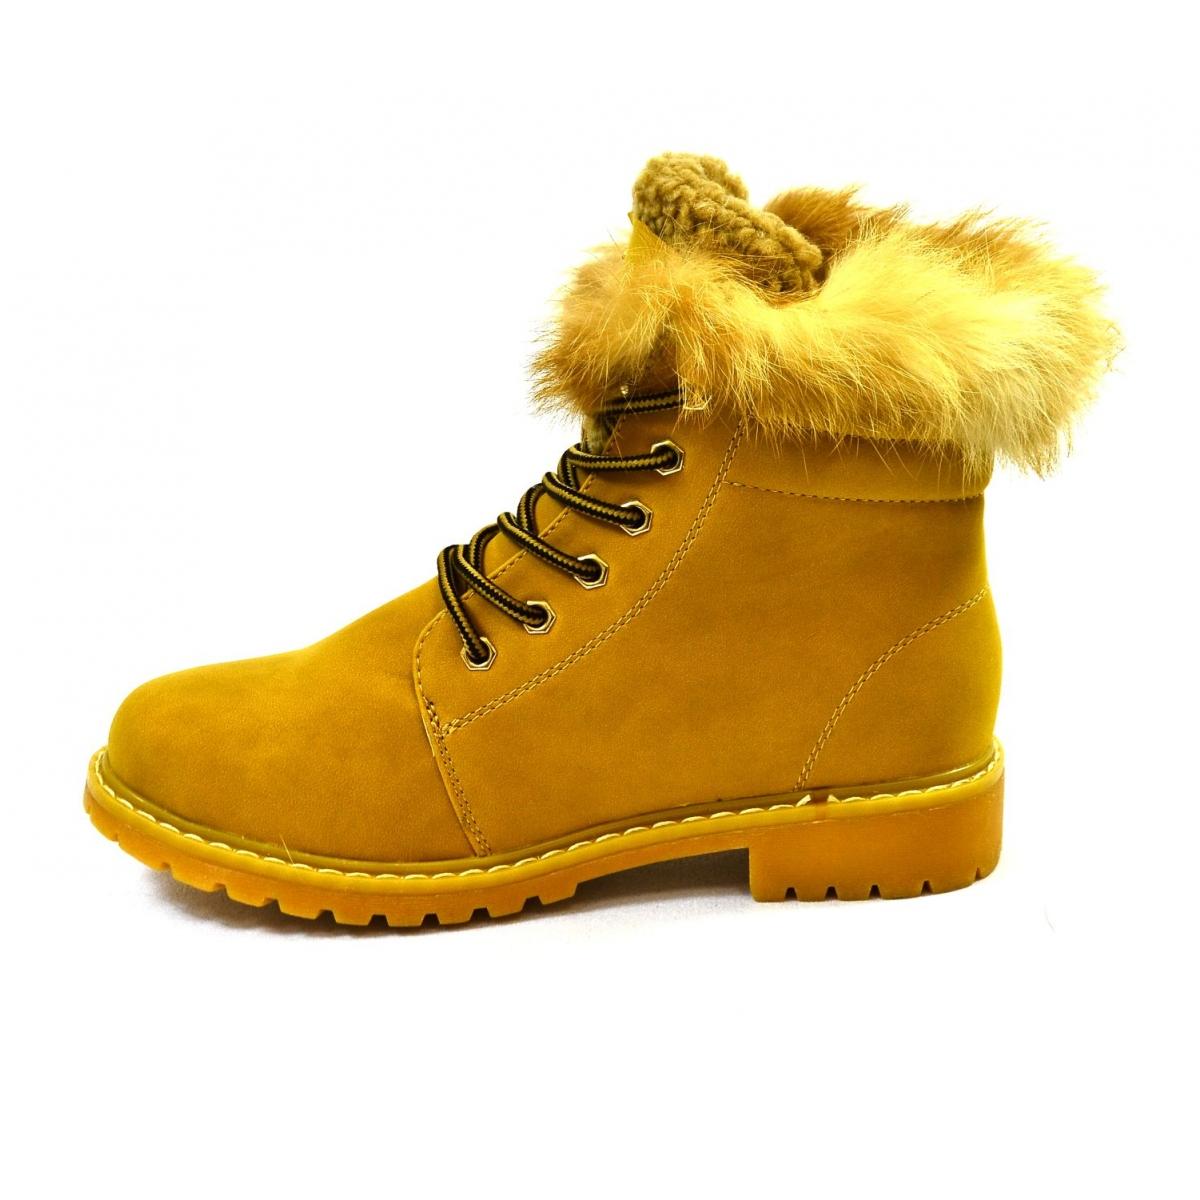 fc107ea7c Dámske žlté zimné topánky KLOE | Johnc.sk